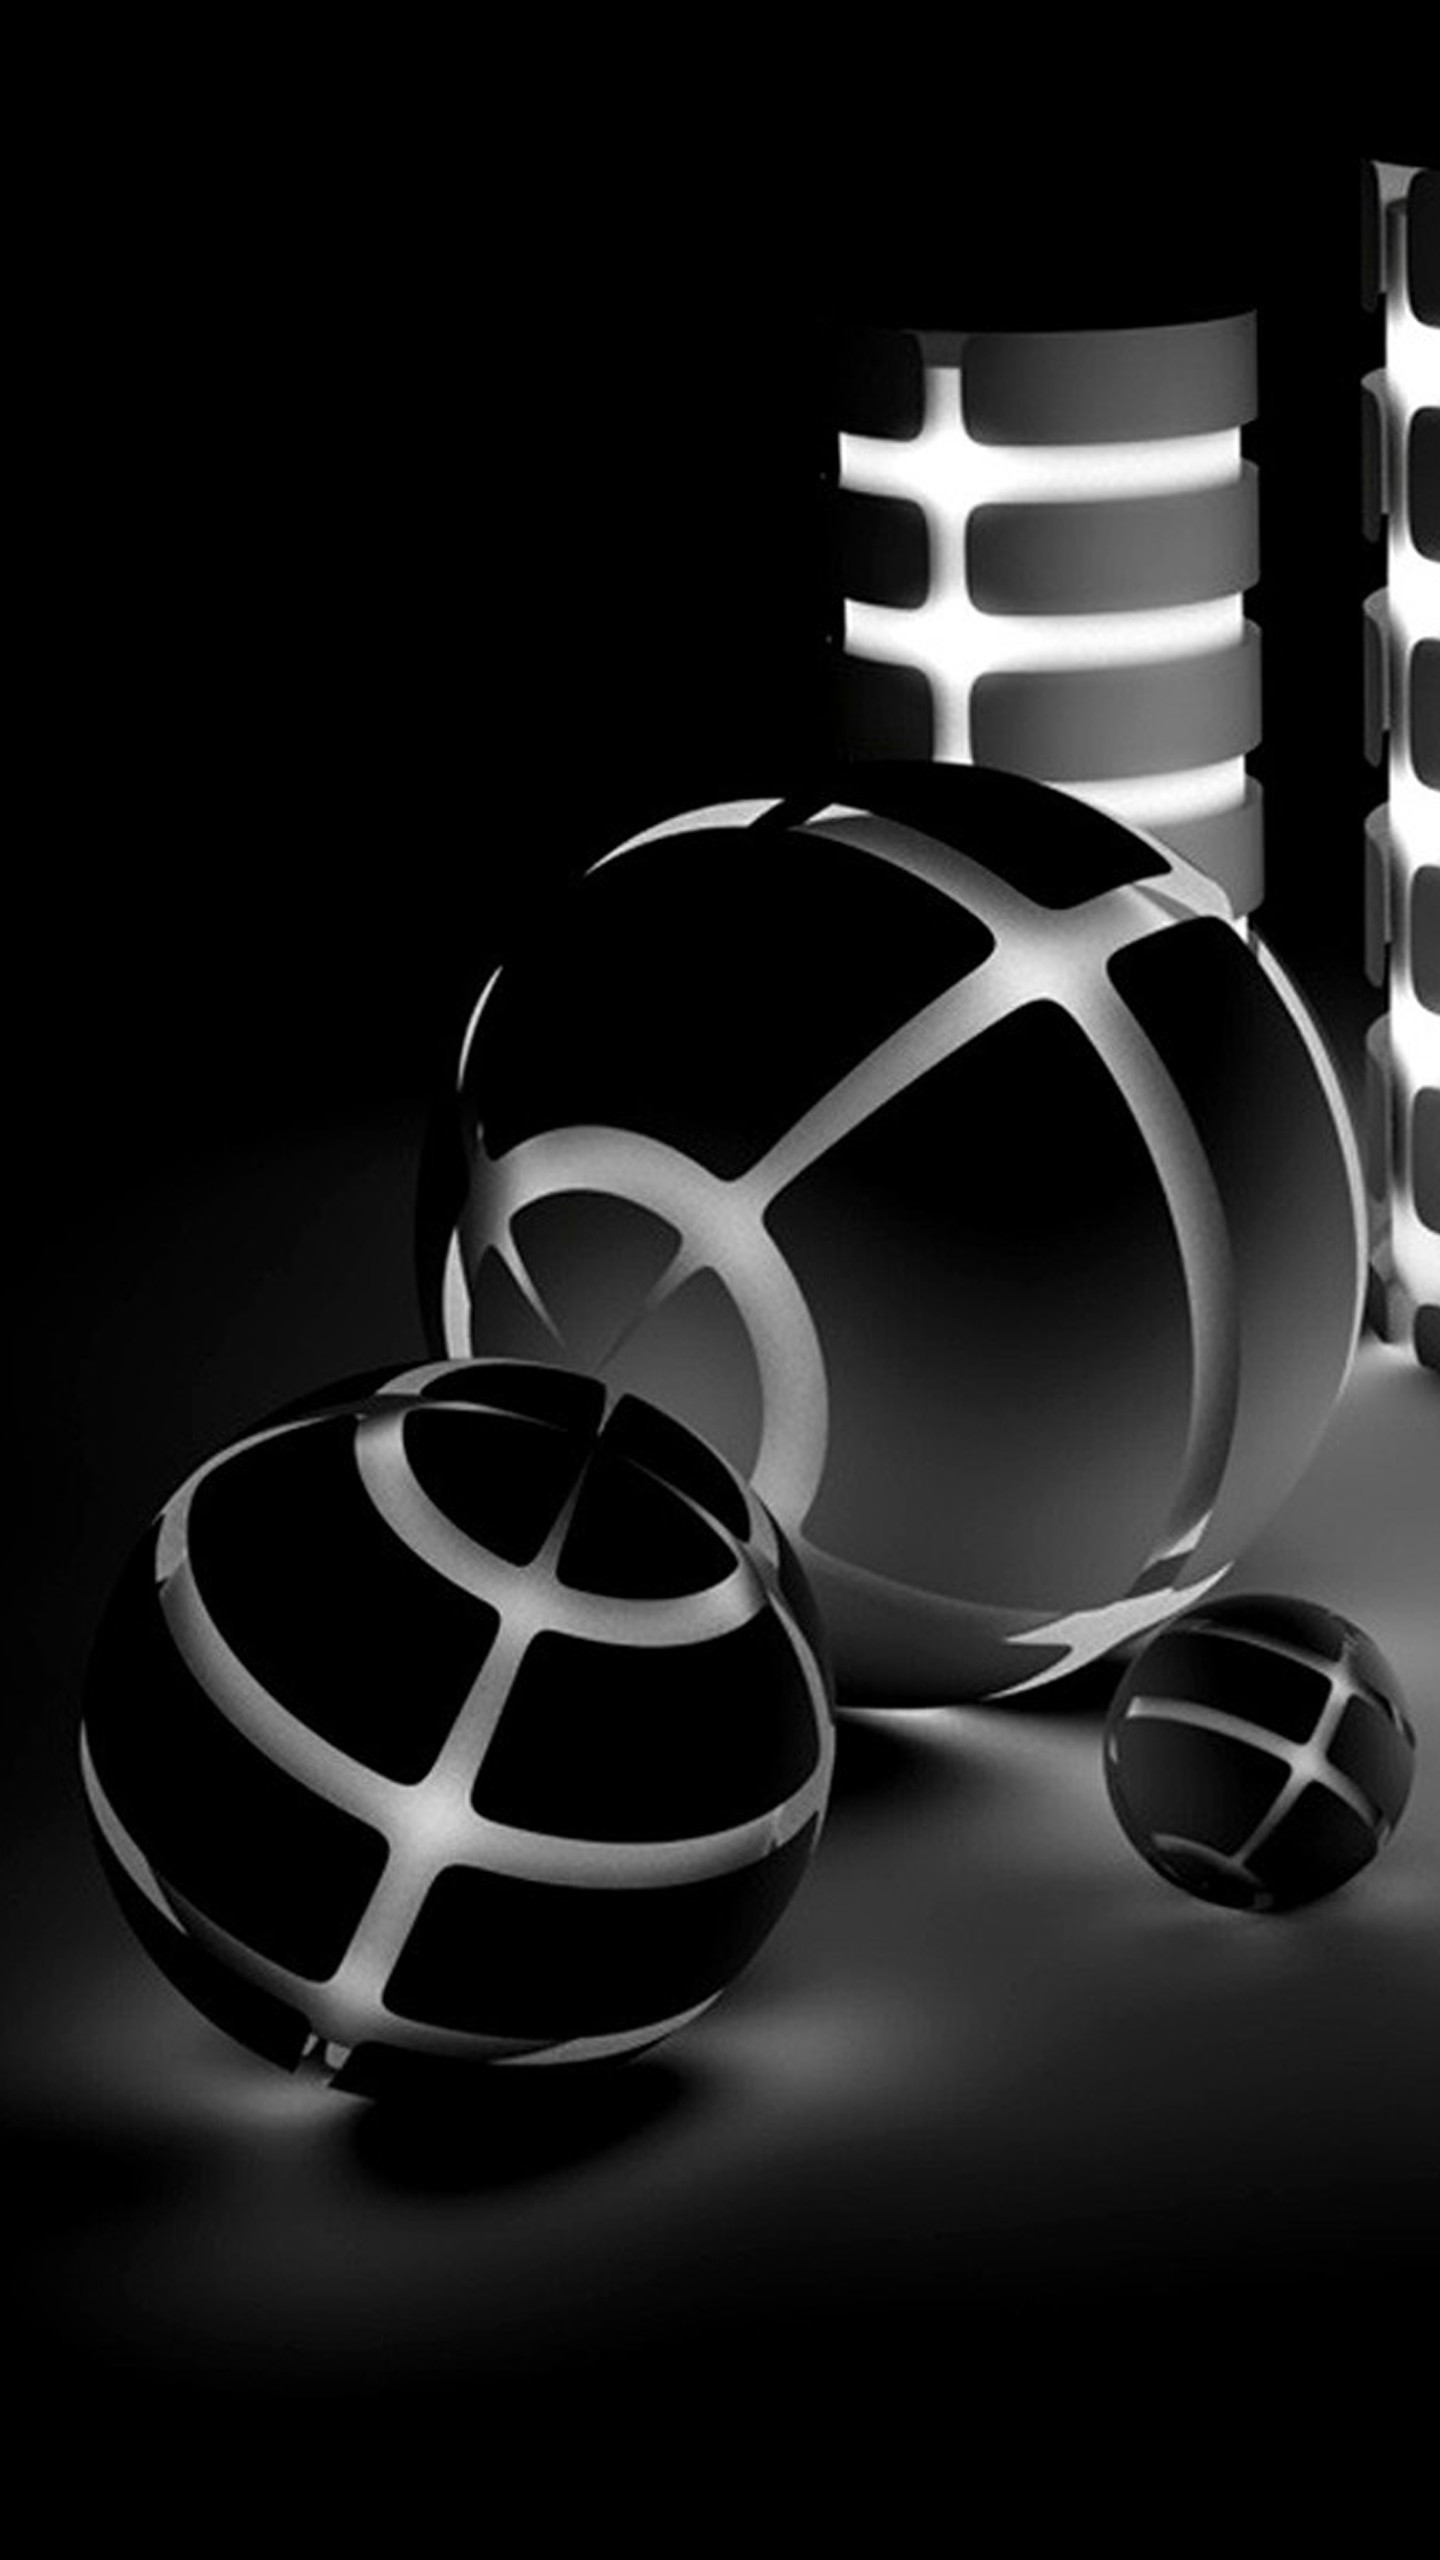 Black 3D Wallpaper (70+ Images